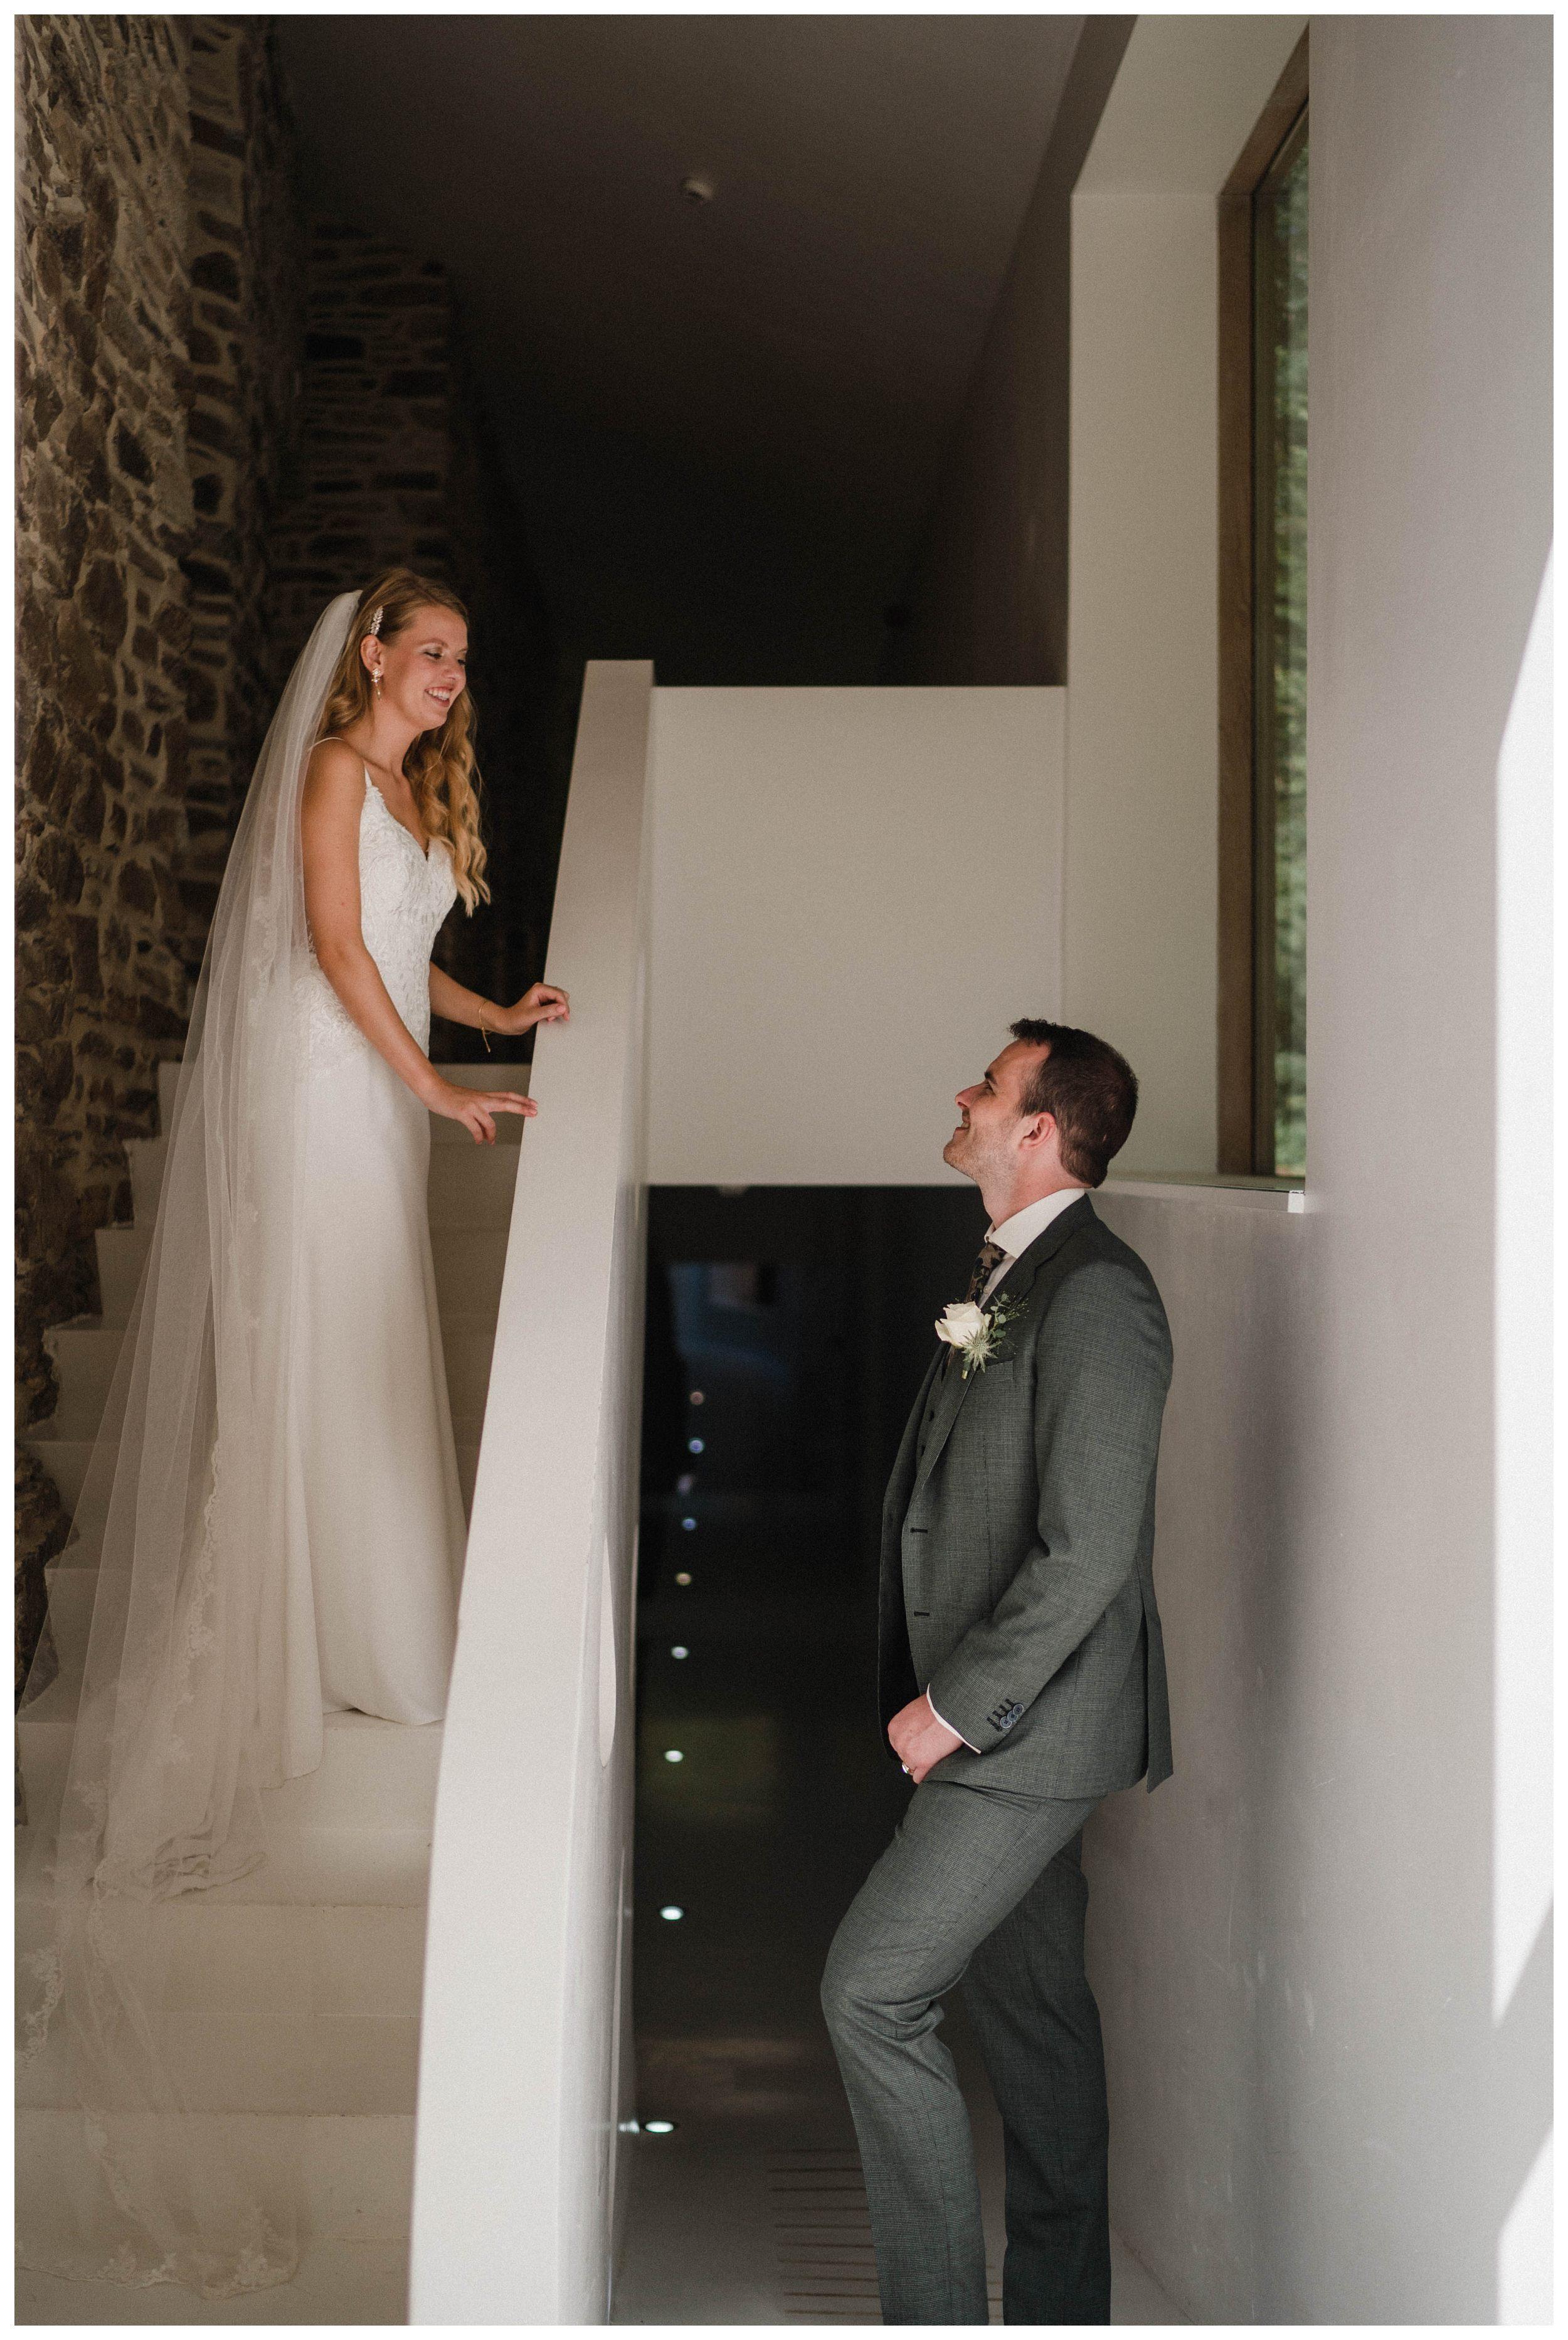 huwelijksfotograaf bruidsfotograaf destinationwedding huwelijksfotografie in ardennen nederland (30).jpg